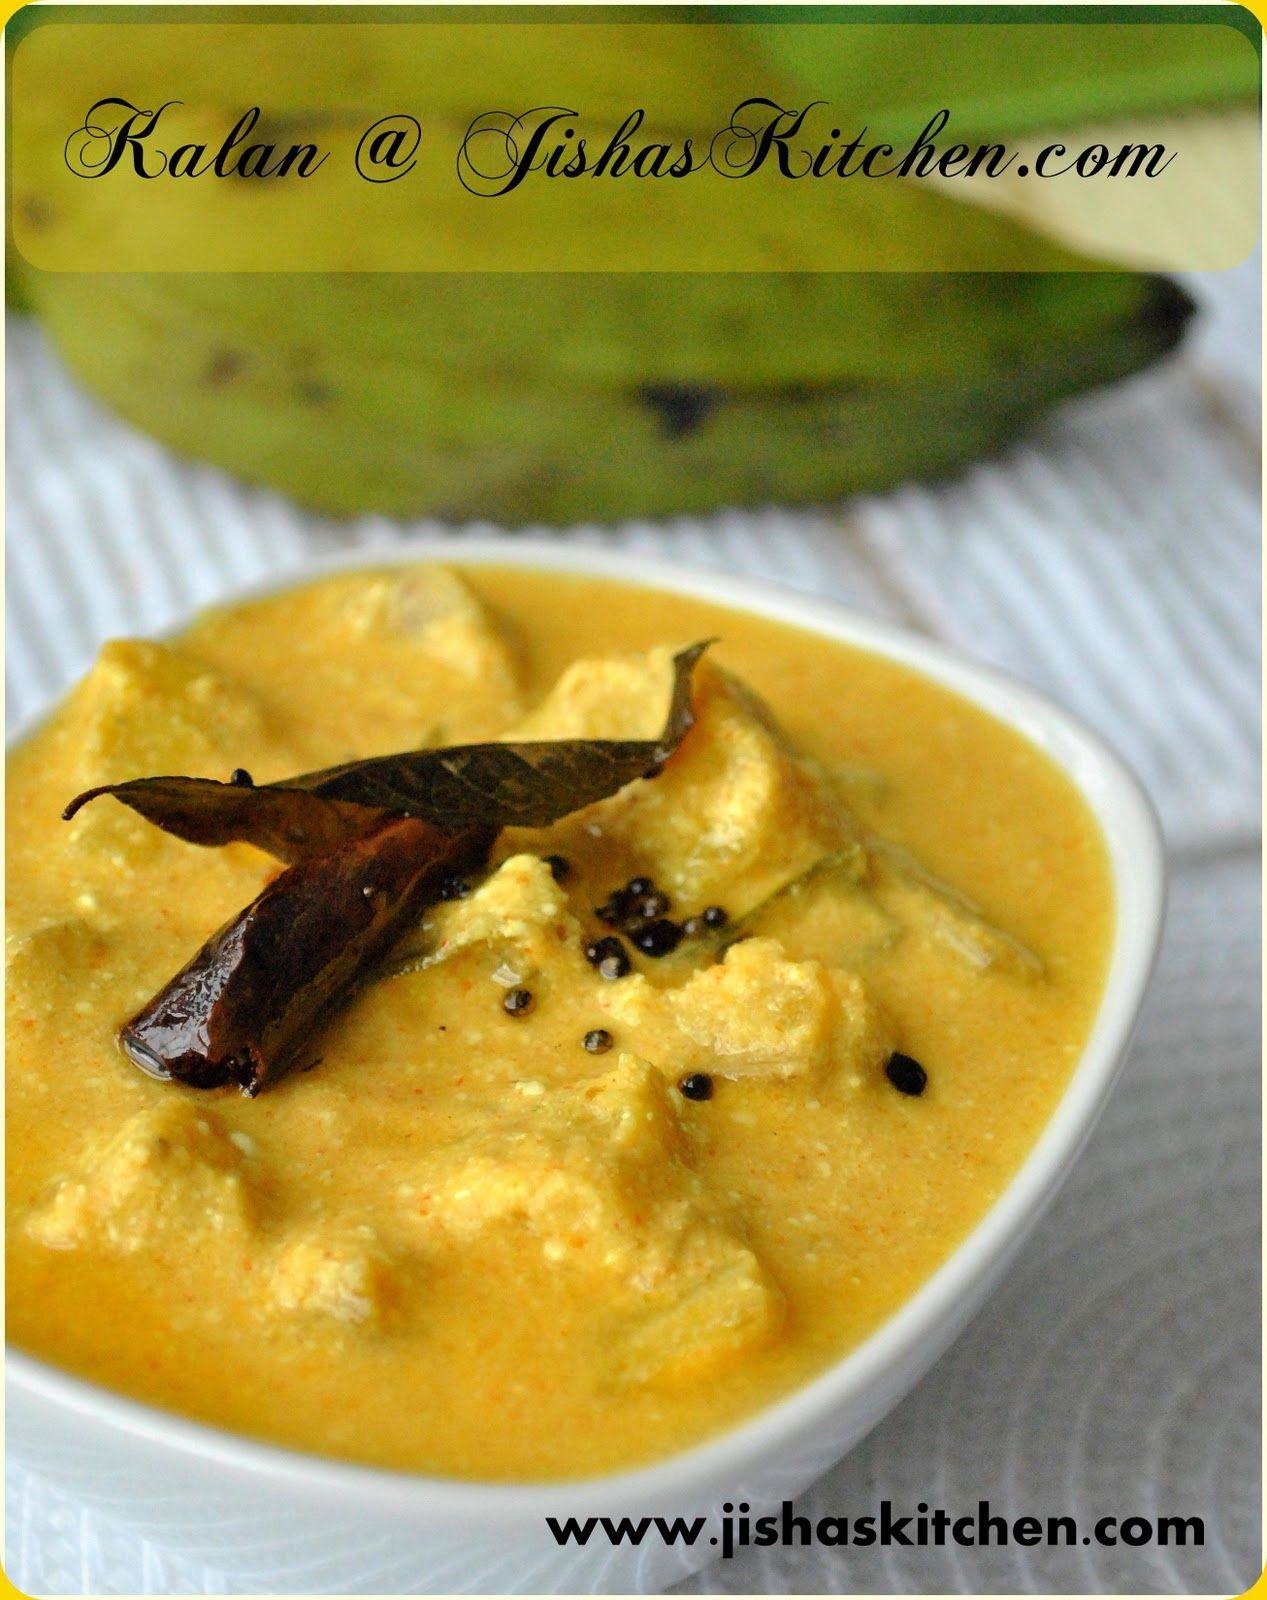 Jisha S Kitchen Kalan Indian Recipes Kerala Nadan Recipes